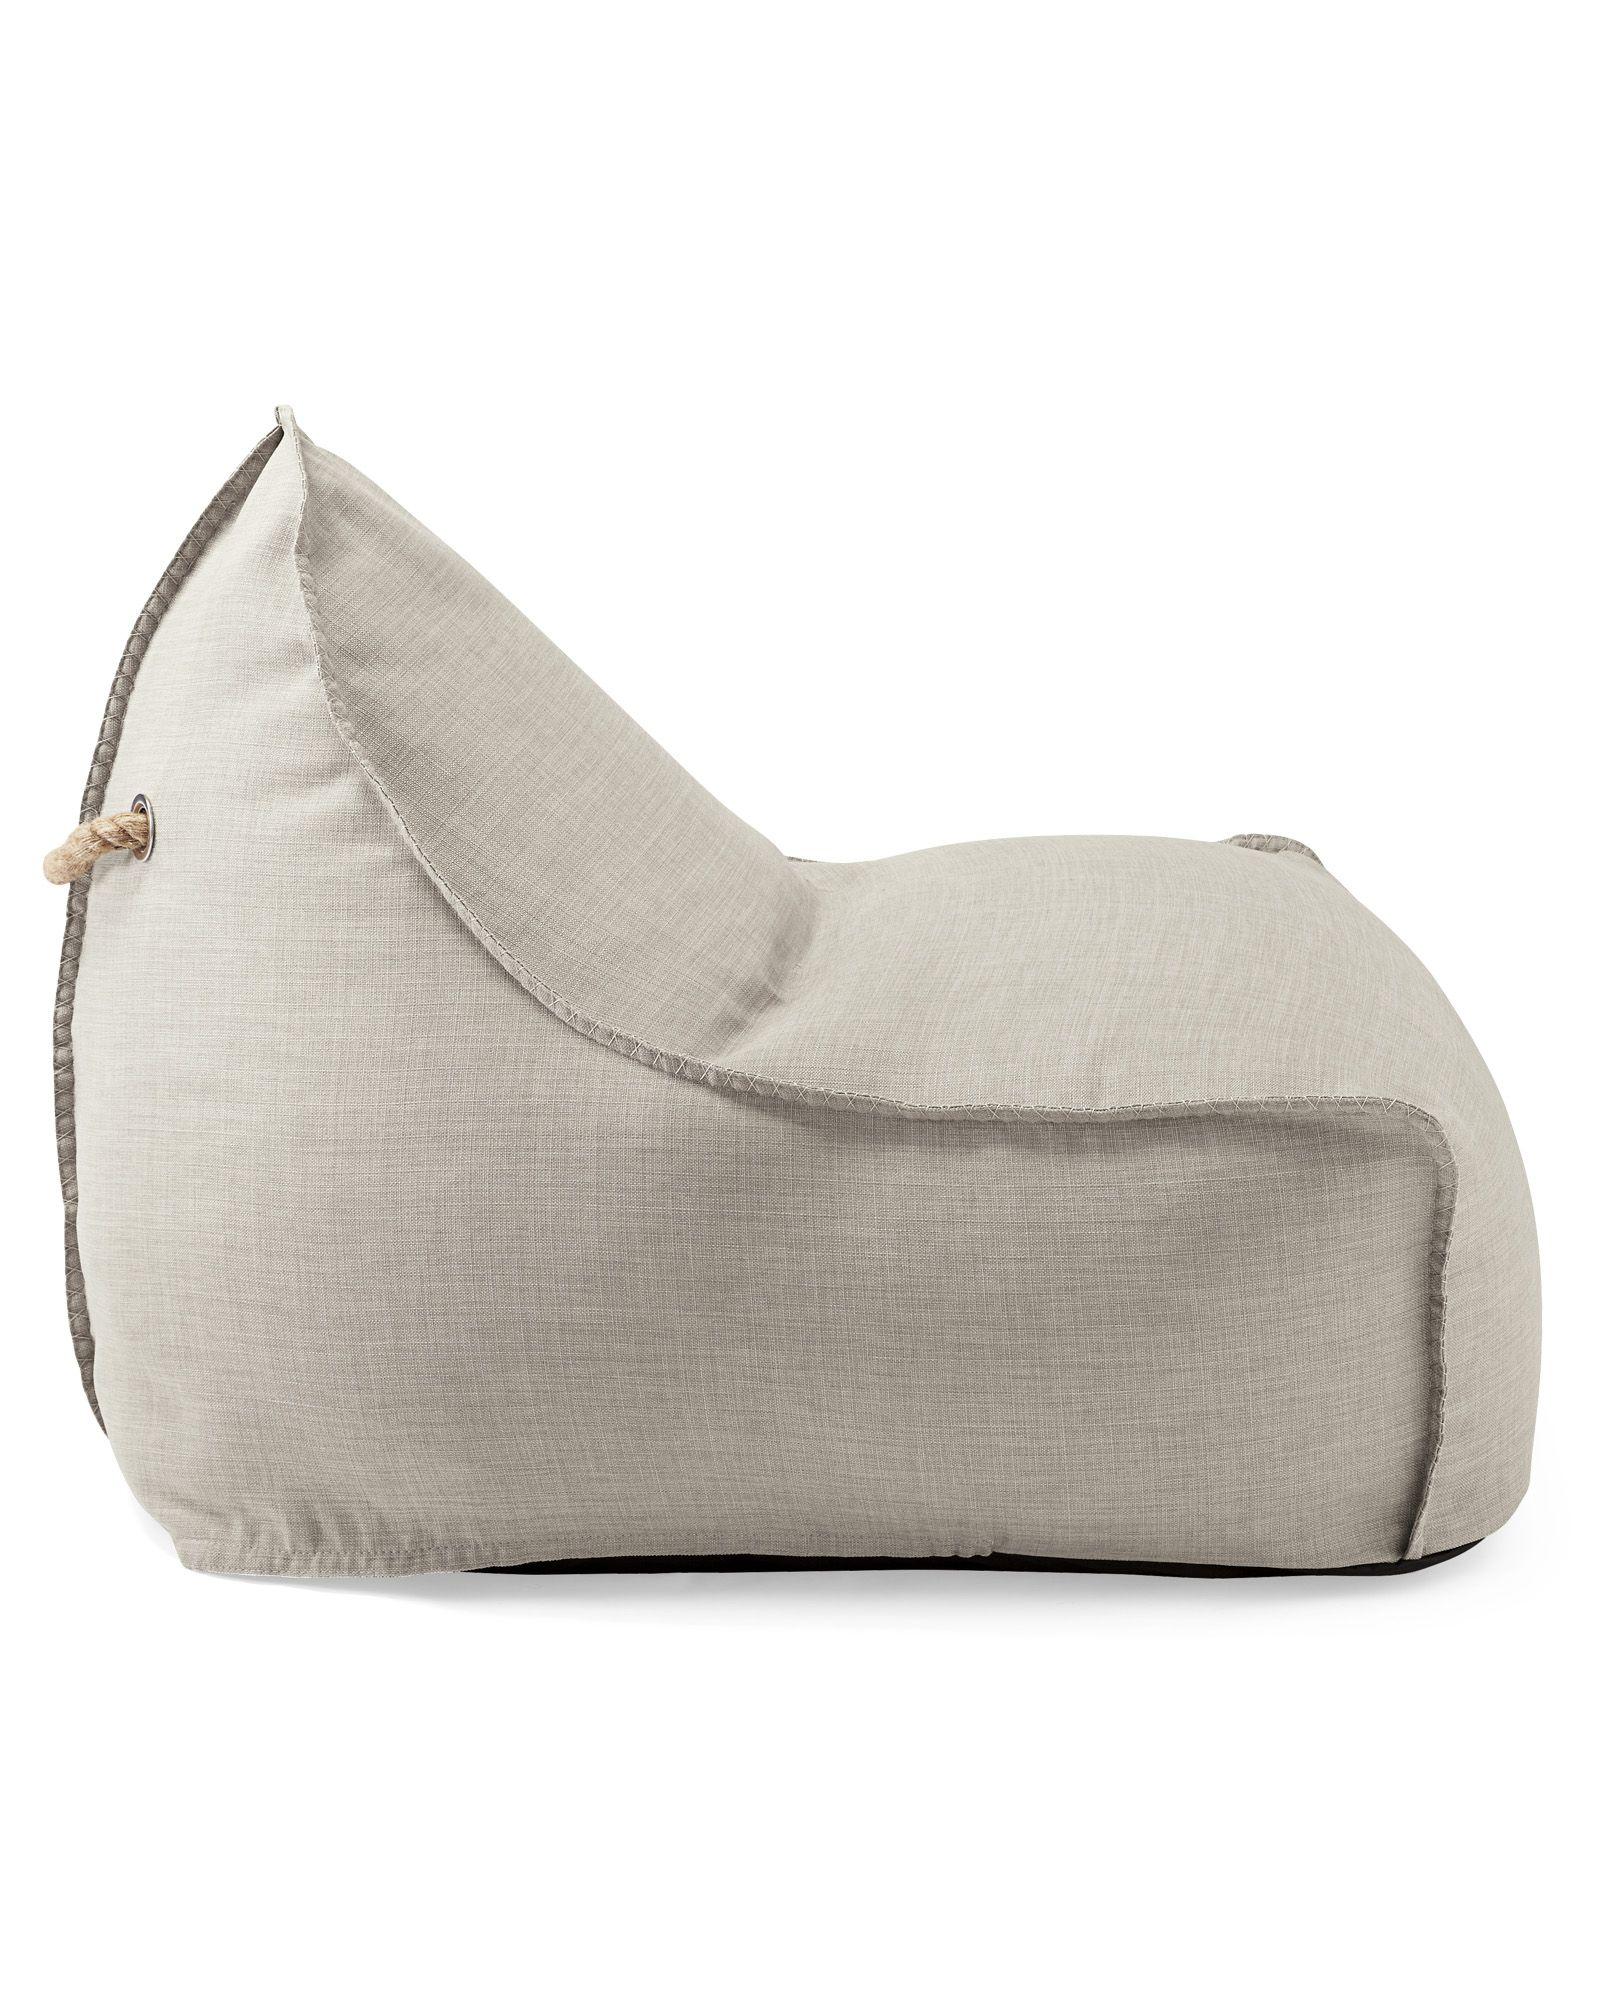 Newport Lounger Solid CH5120 Bean bag Leather bean